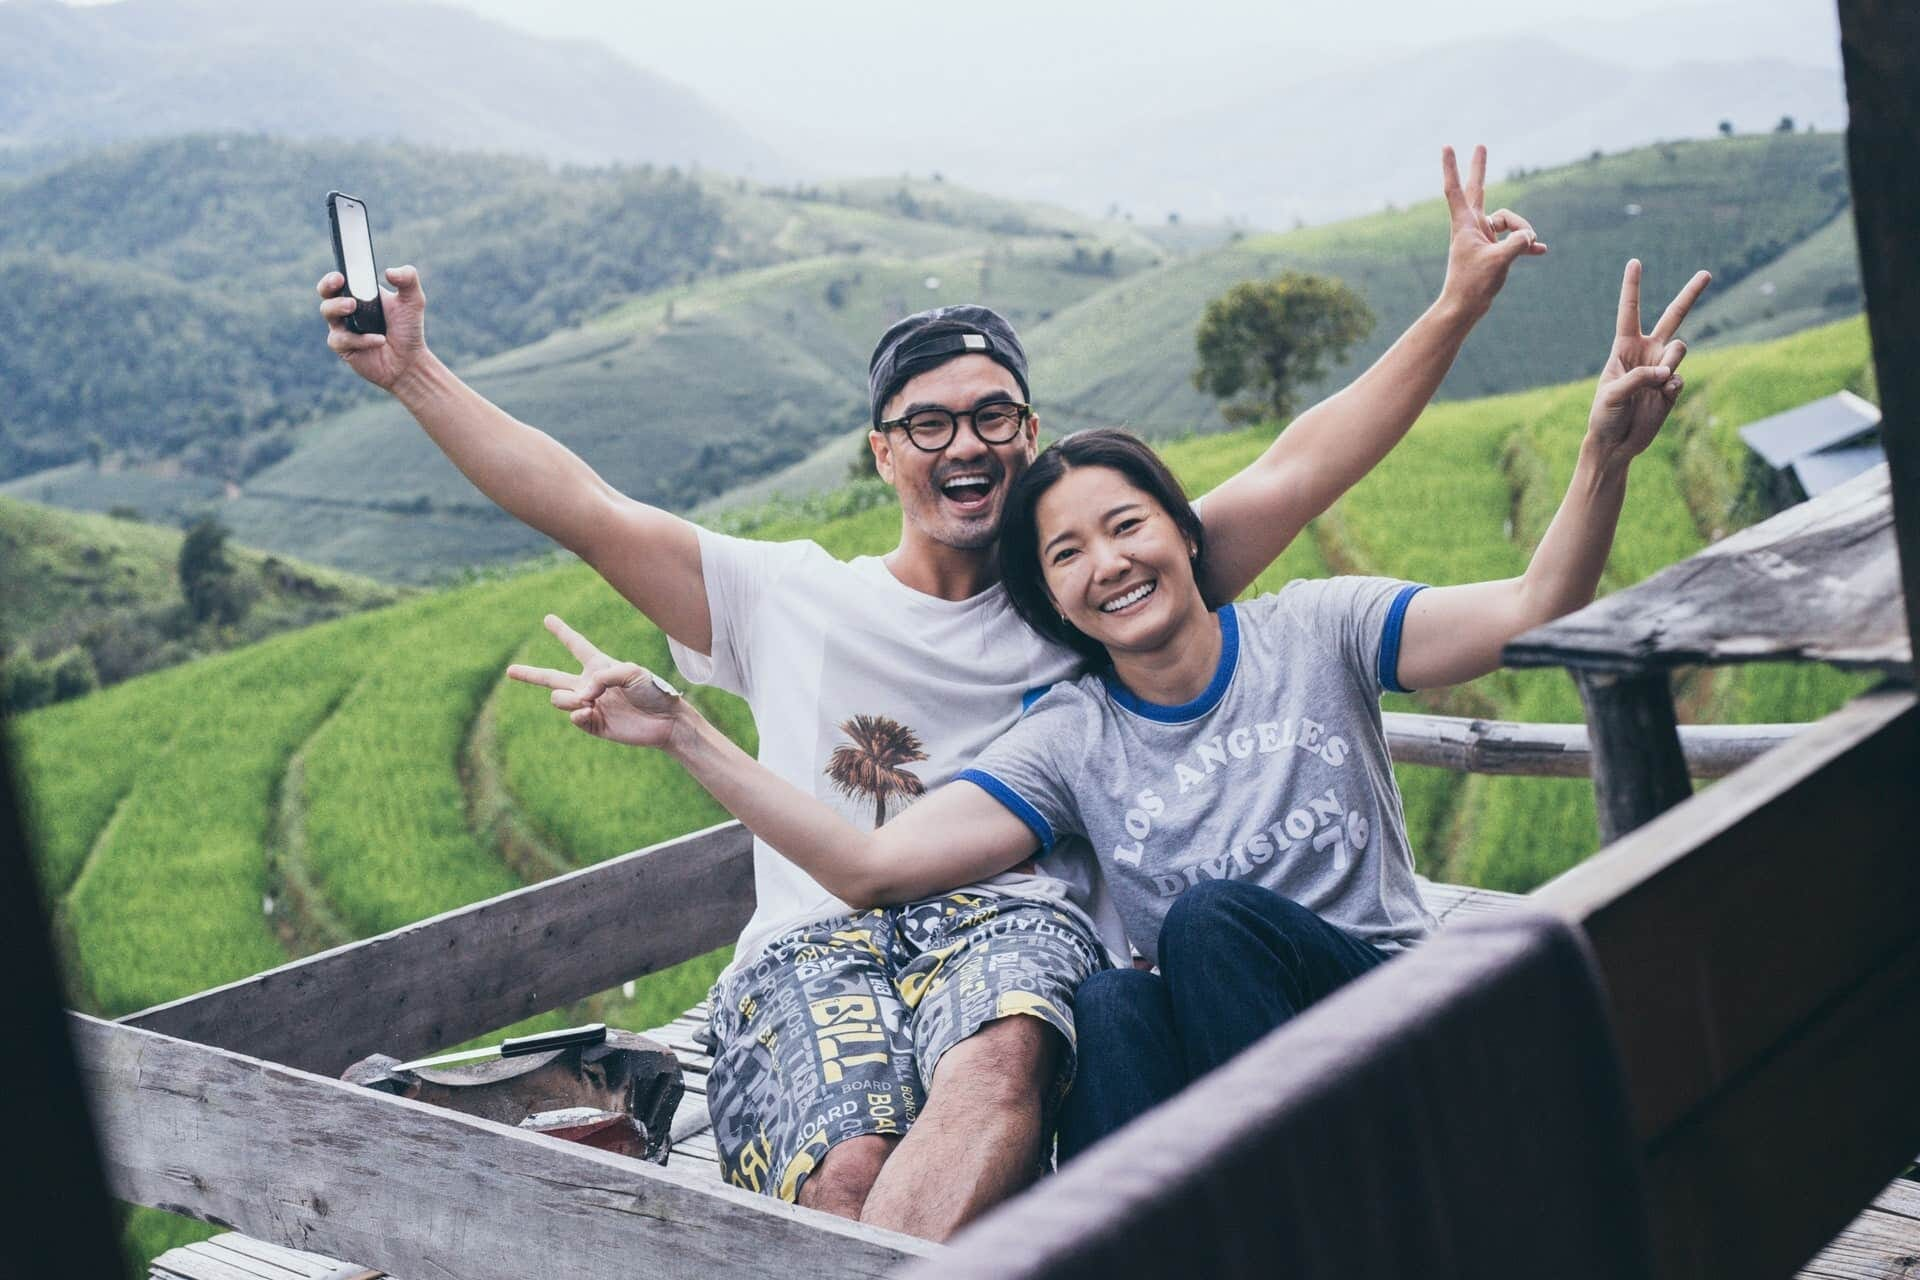 Lleva tu SIM para Singapur para ser un nómada digital